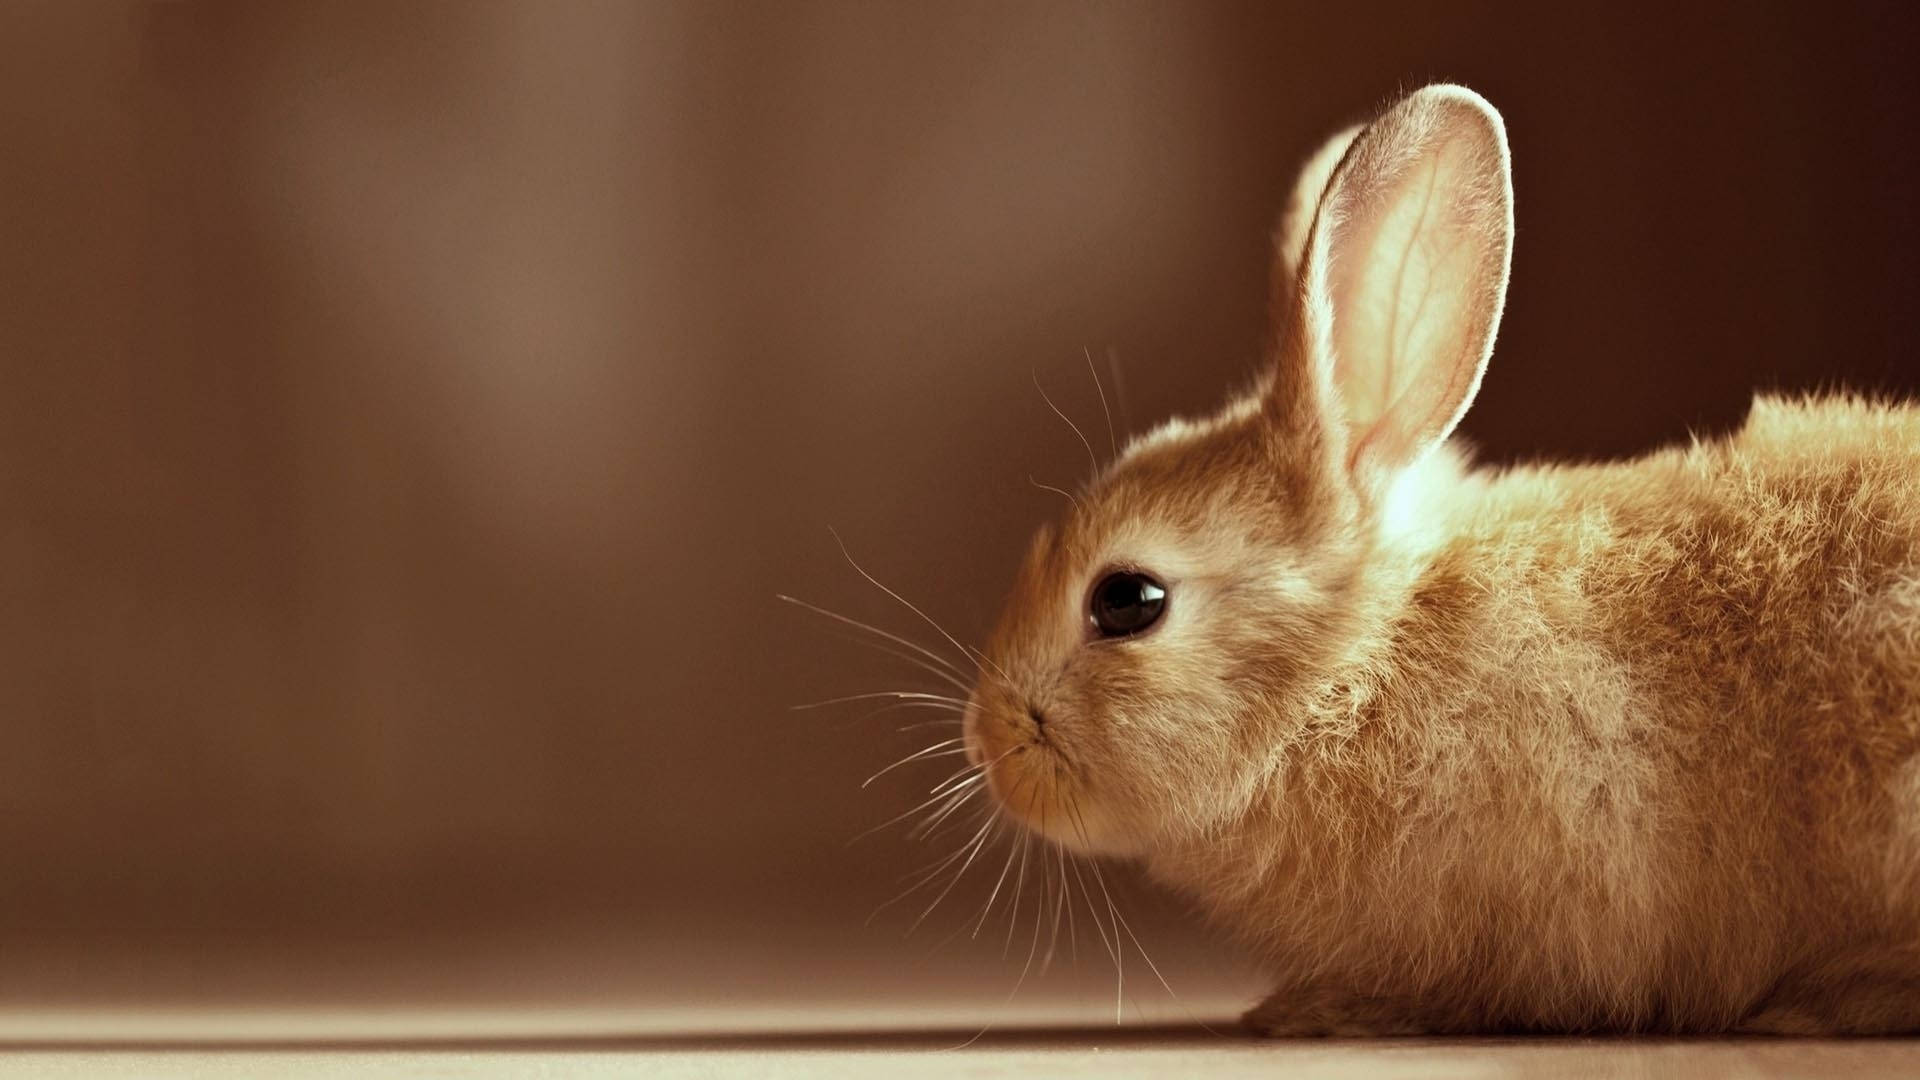 Cute Rabbit computer wallpaper